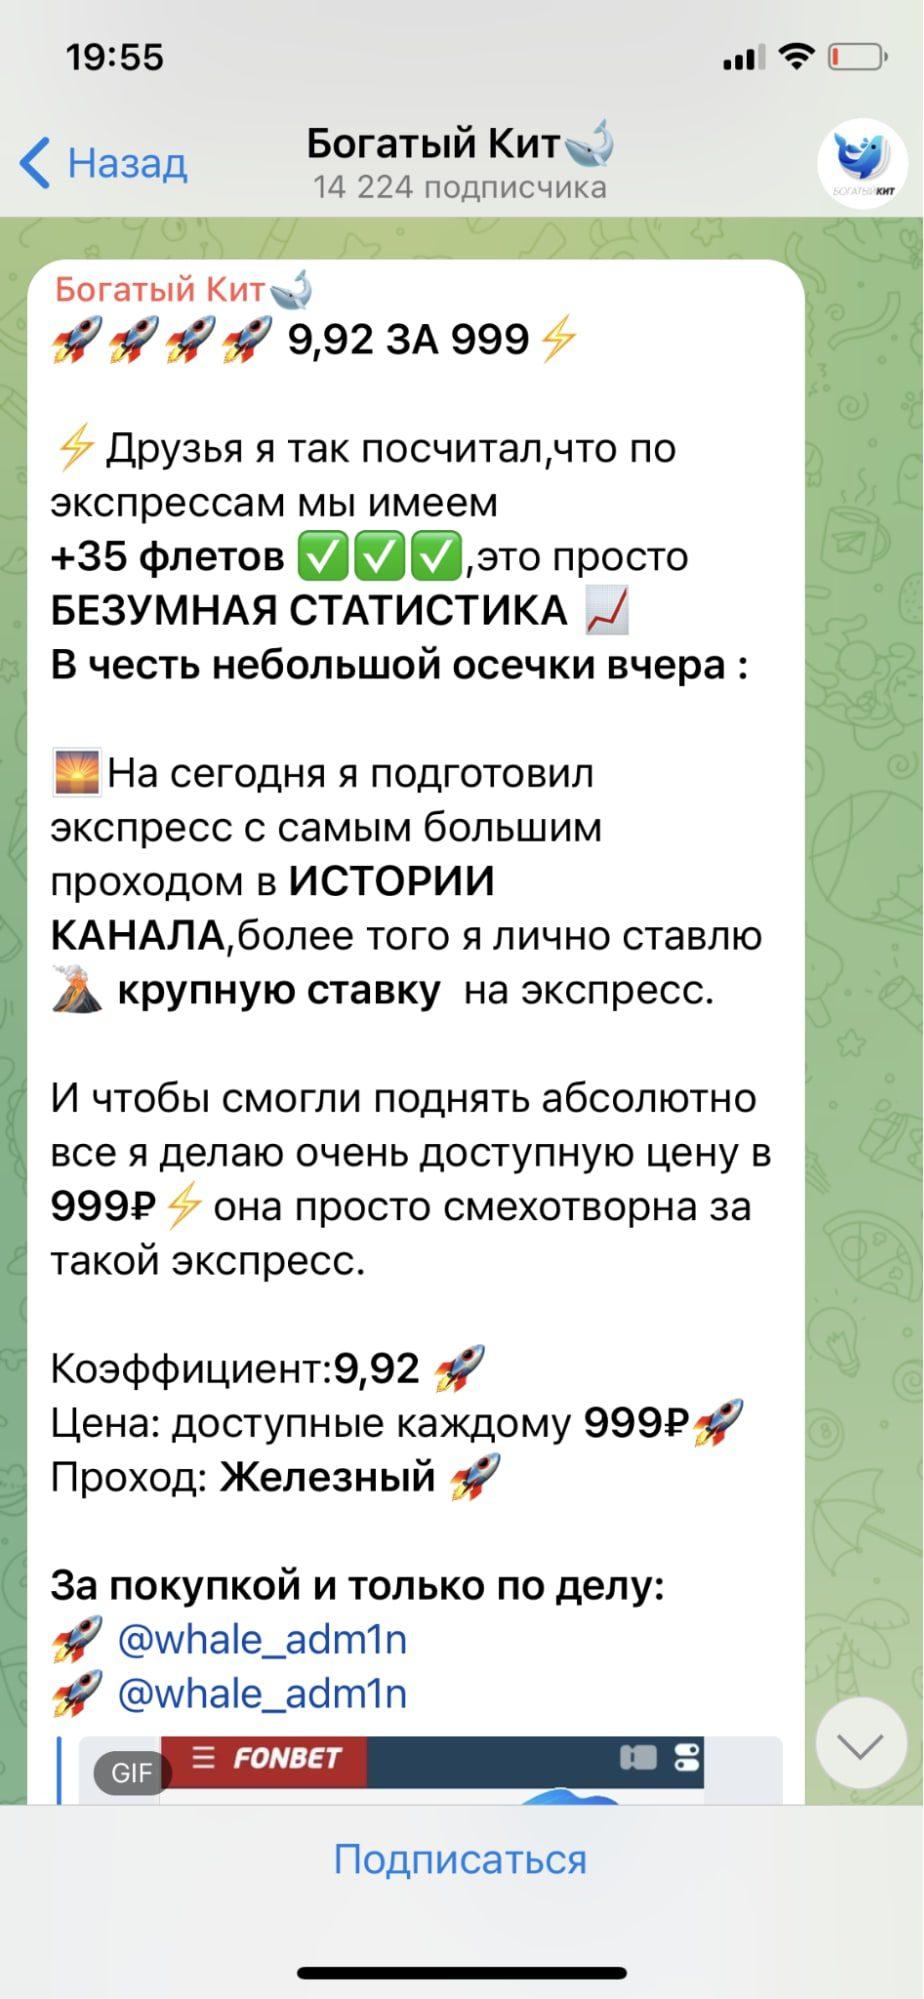 Статистика каппера Богатый Кит в Телеграмм